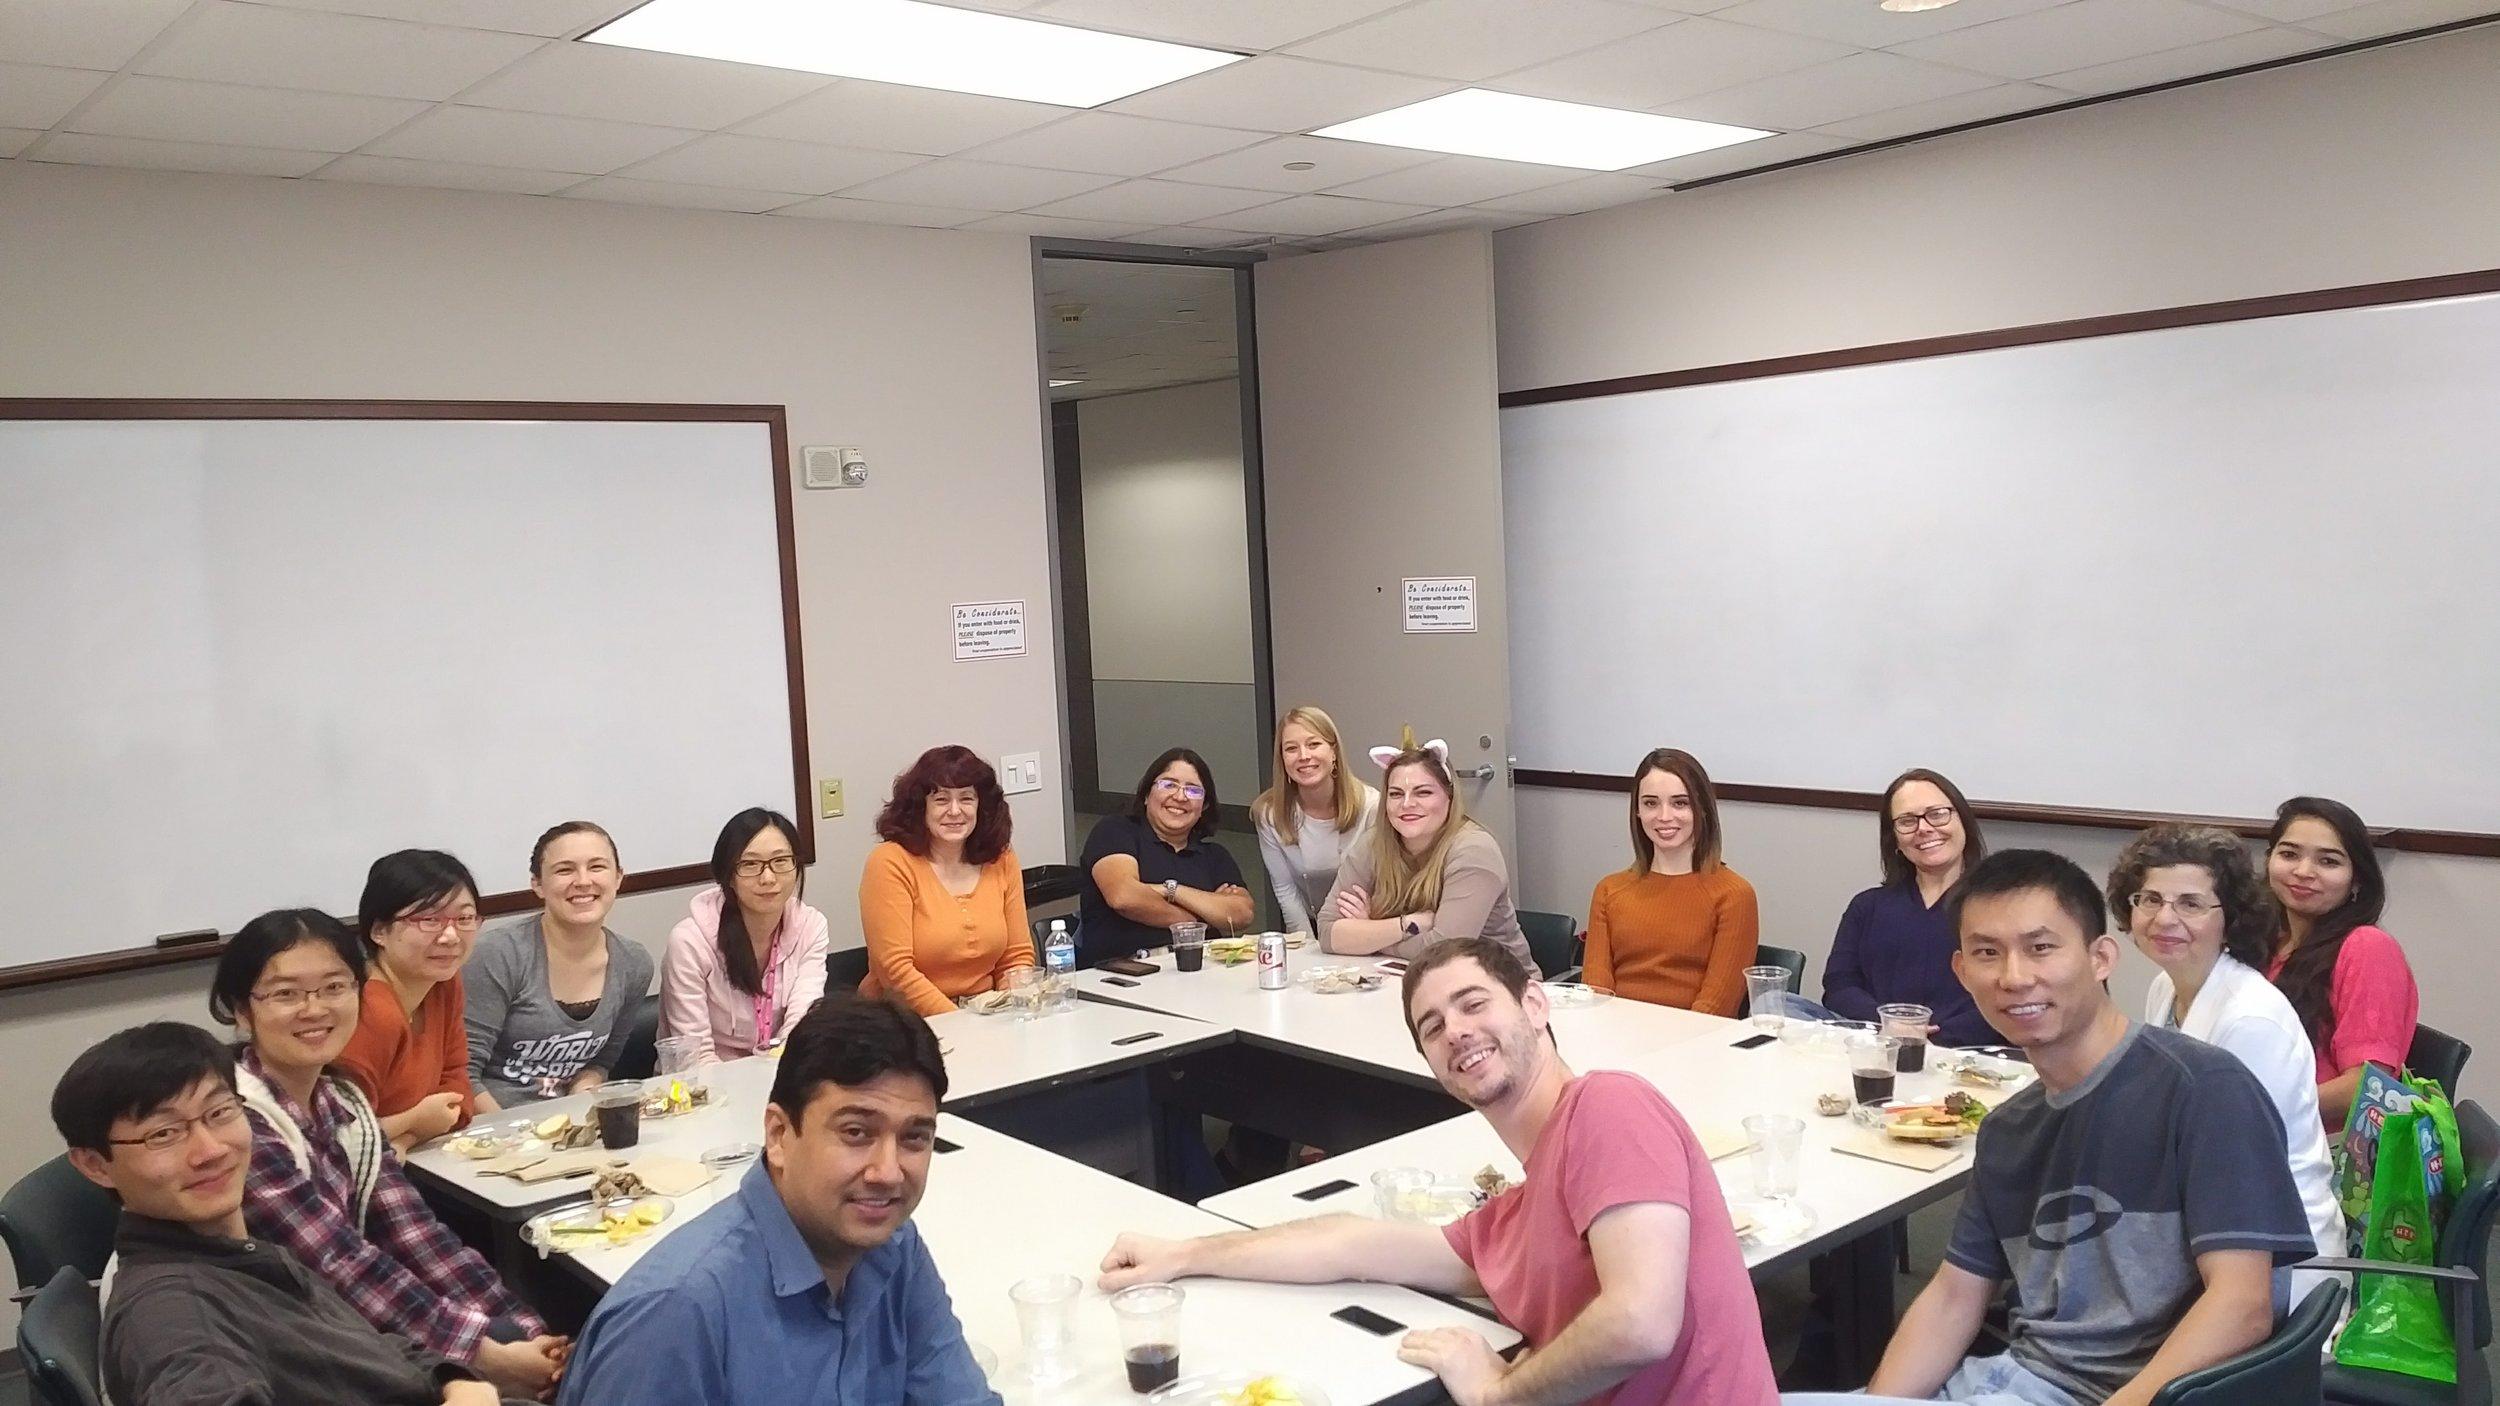 Lab lunch celebrating Sarah's new job at Castle Biosciences.